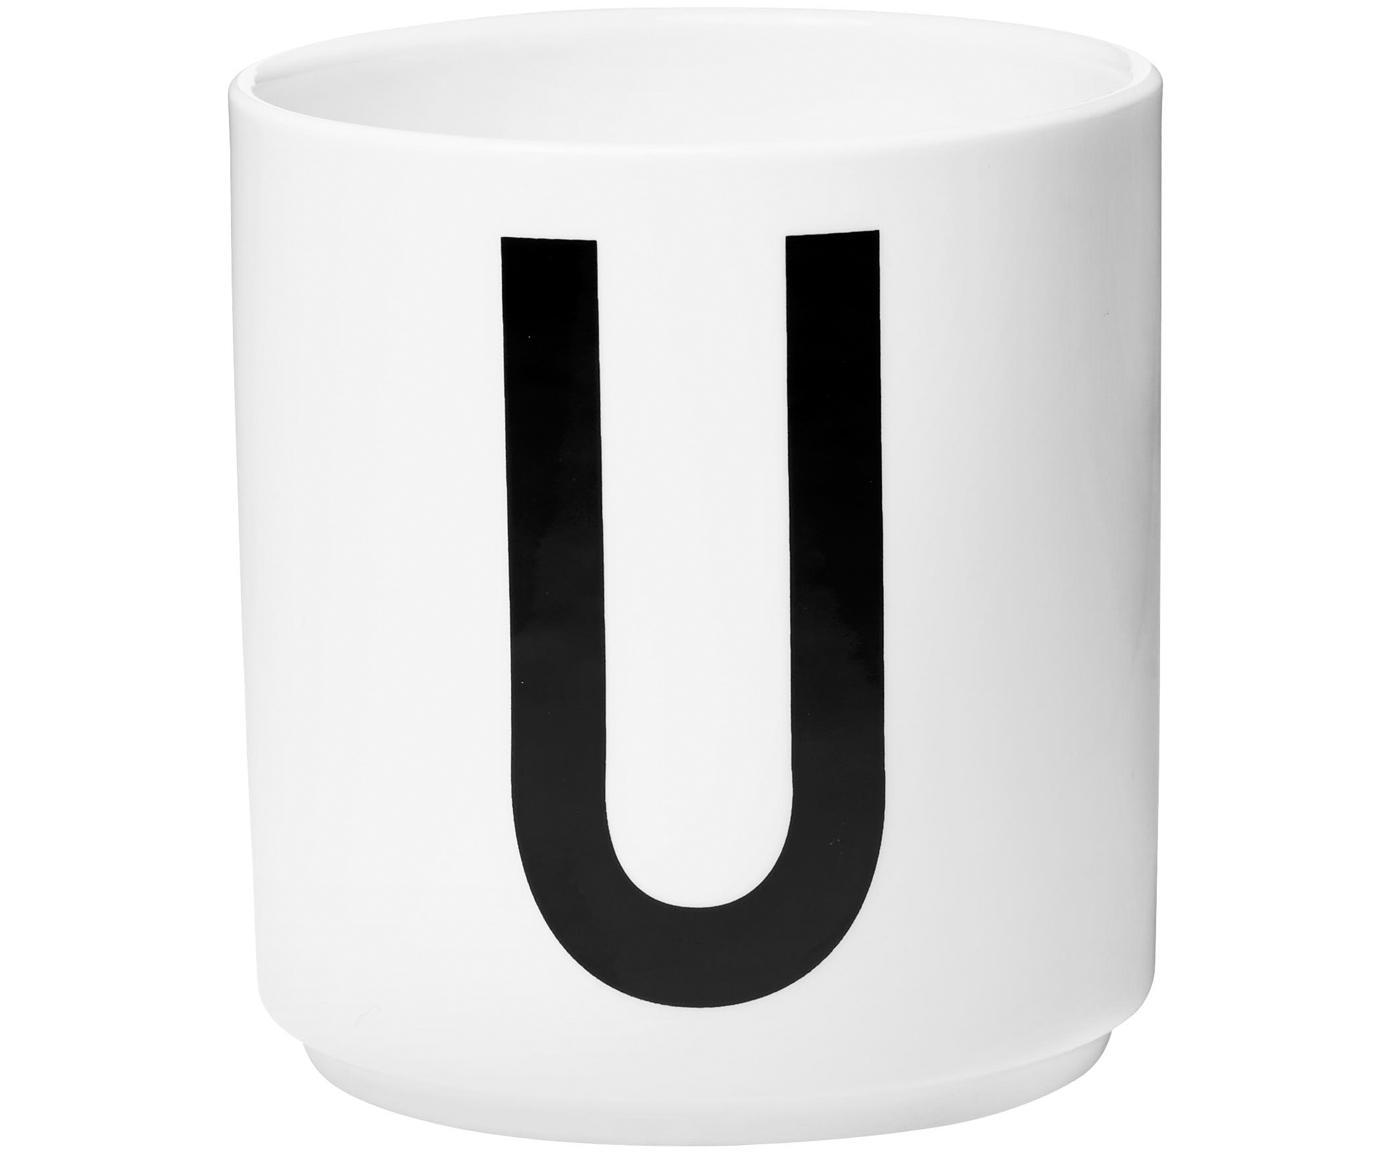 Taza de diseño Personal (variantes de A a Z), Porcelana fina Bone China, Blanco, negro, Taza U